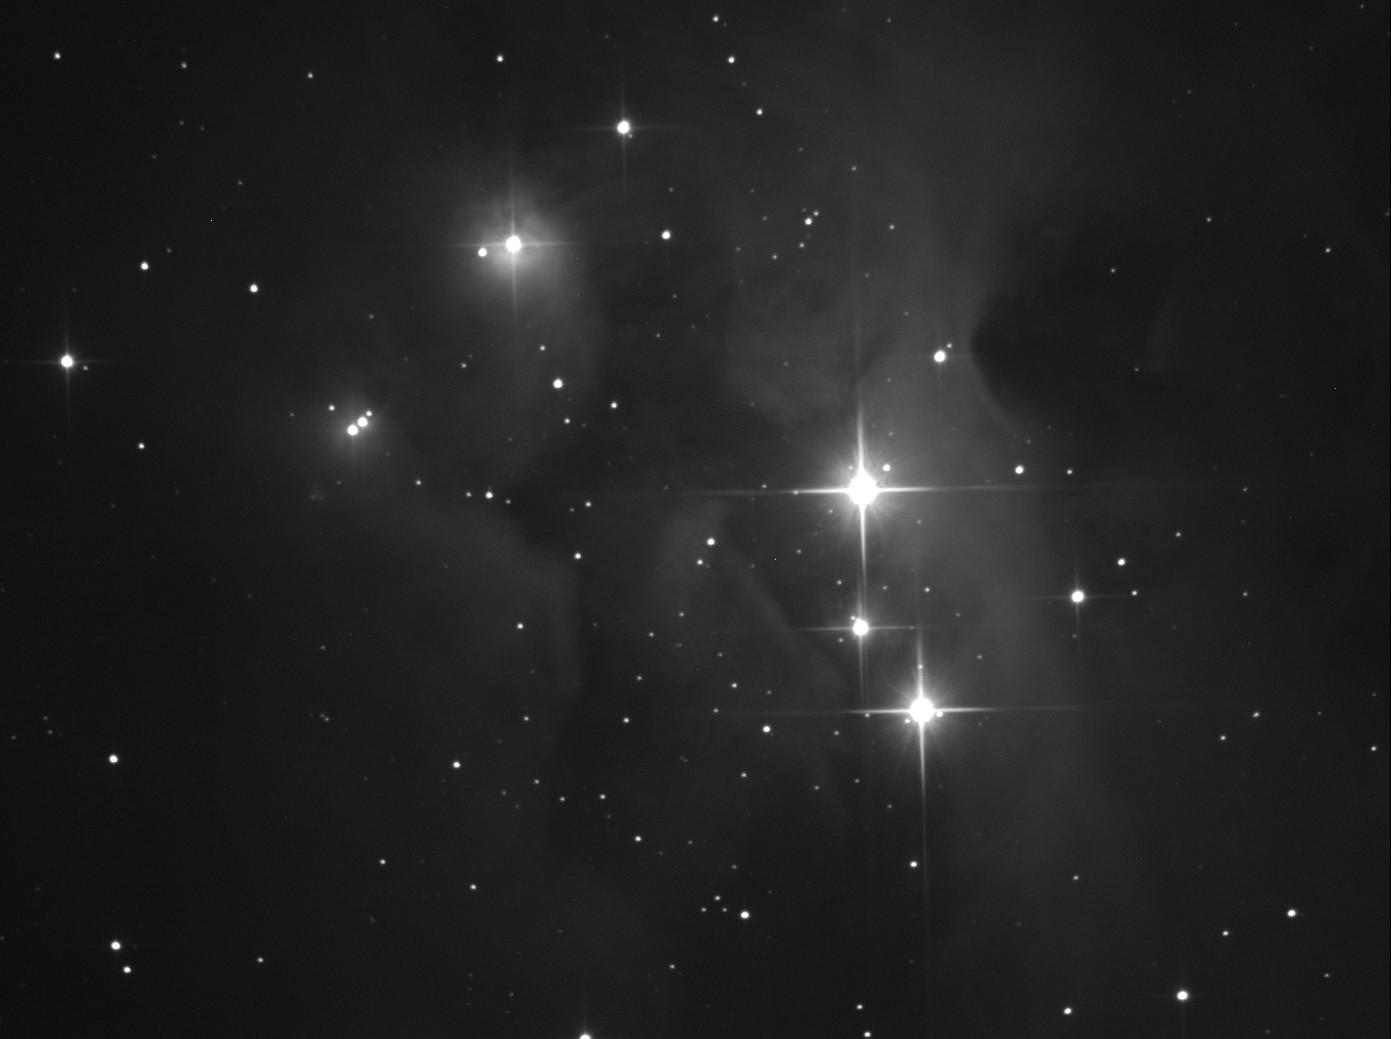 Sortie le 9 10 2015 NGC1977